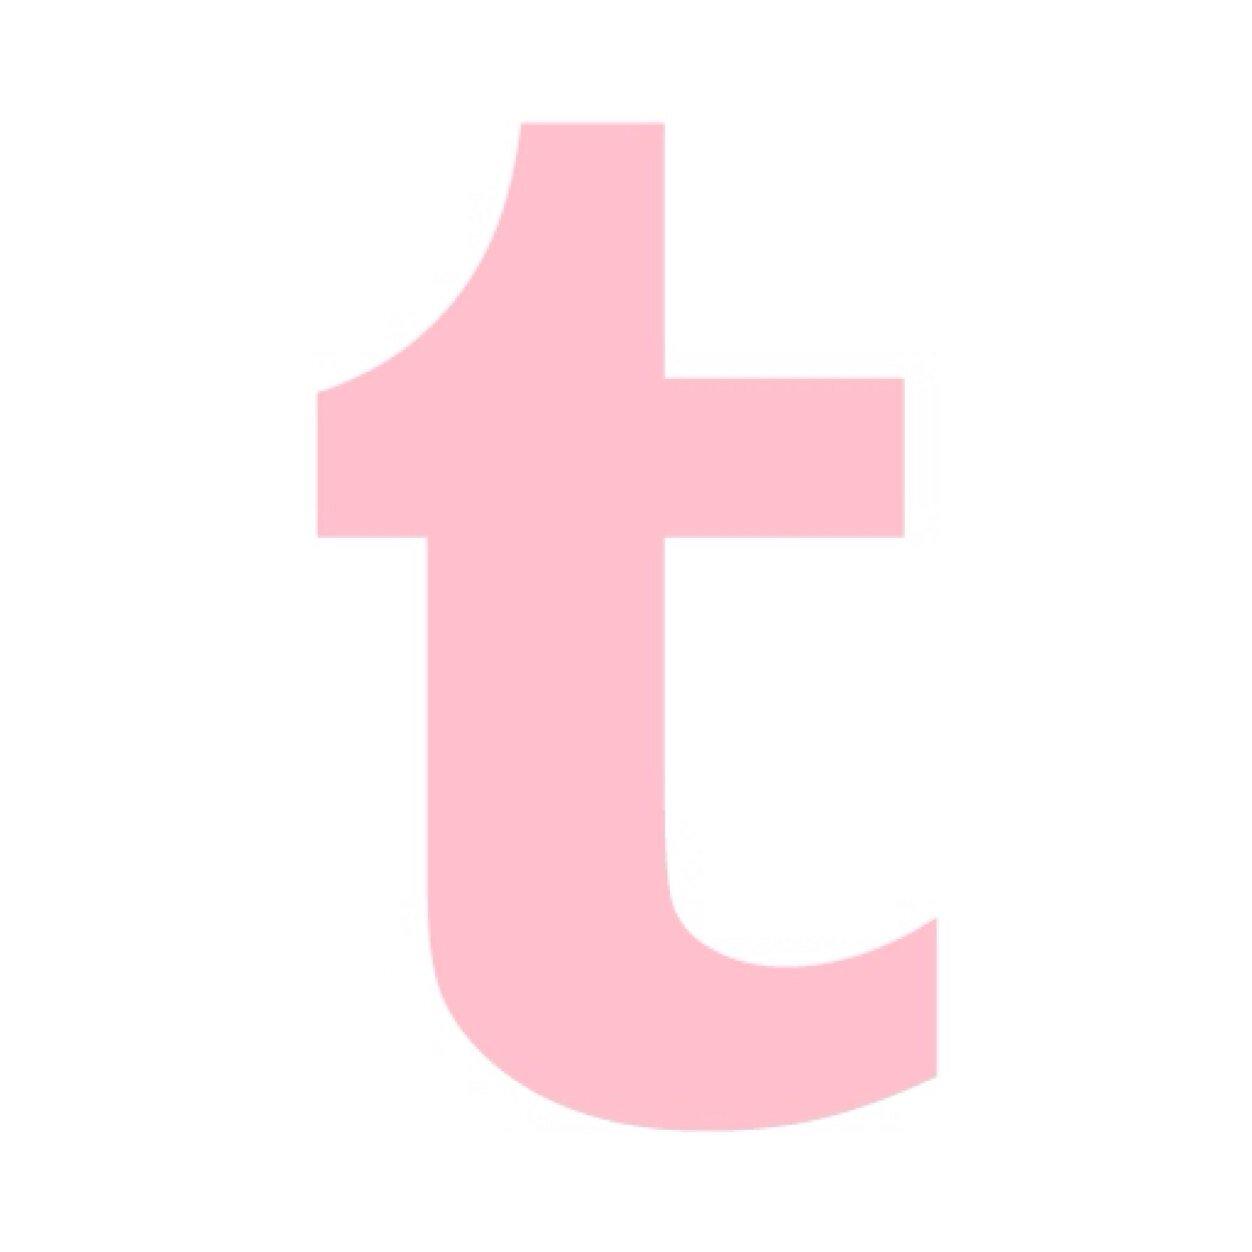 logo twitter tumblr